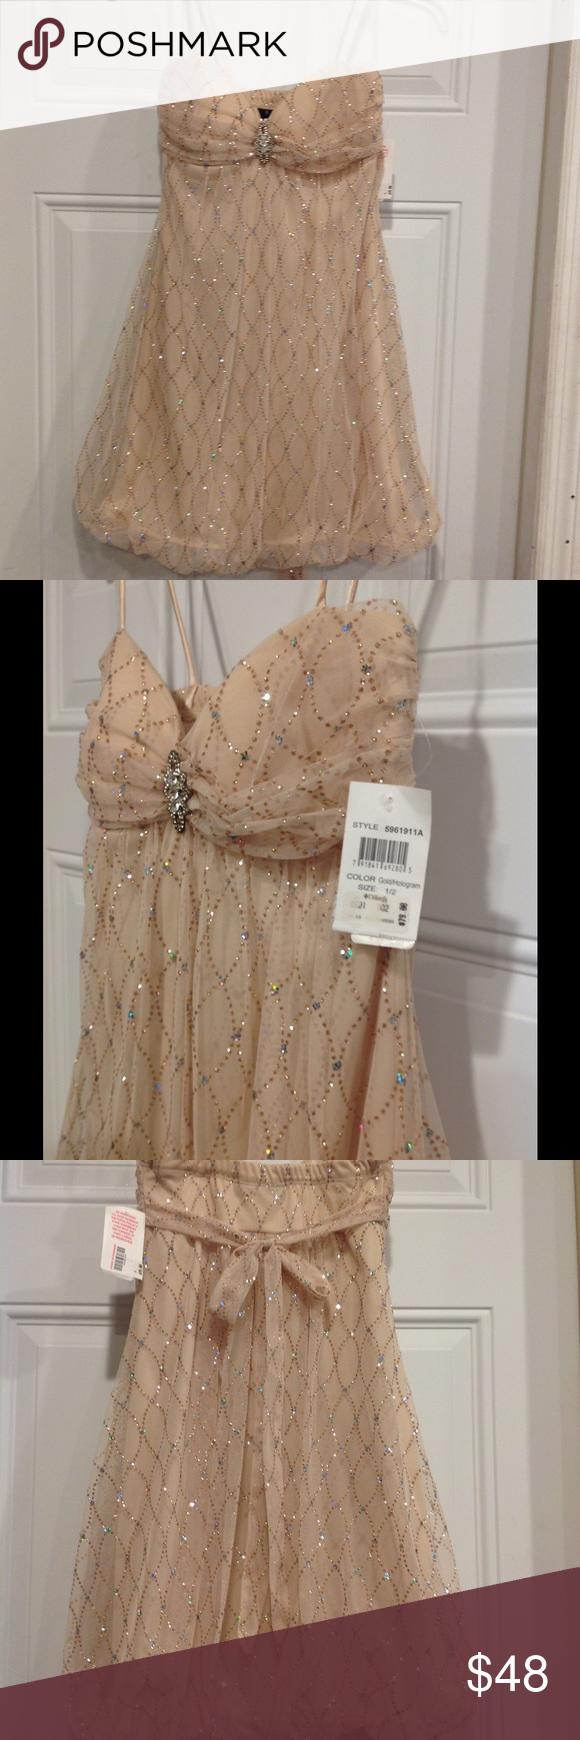 Goldhologram dillards dress bdarlin size middle school dance